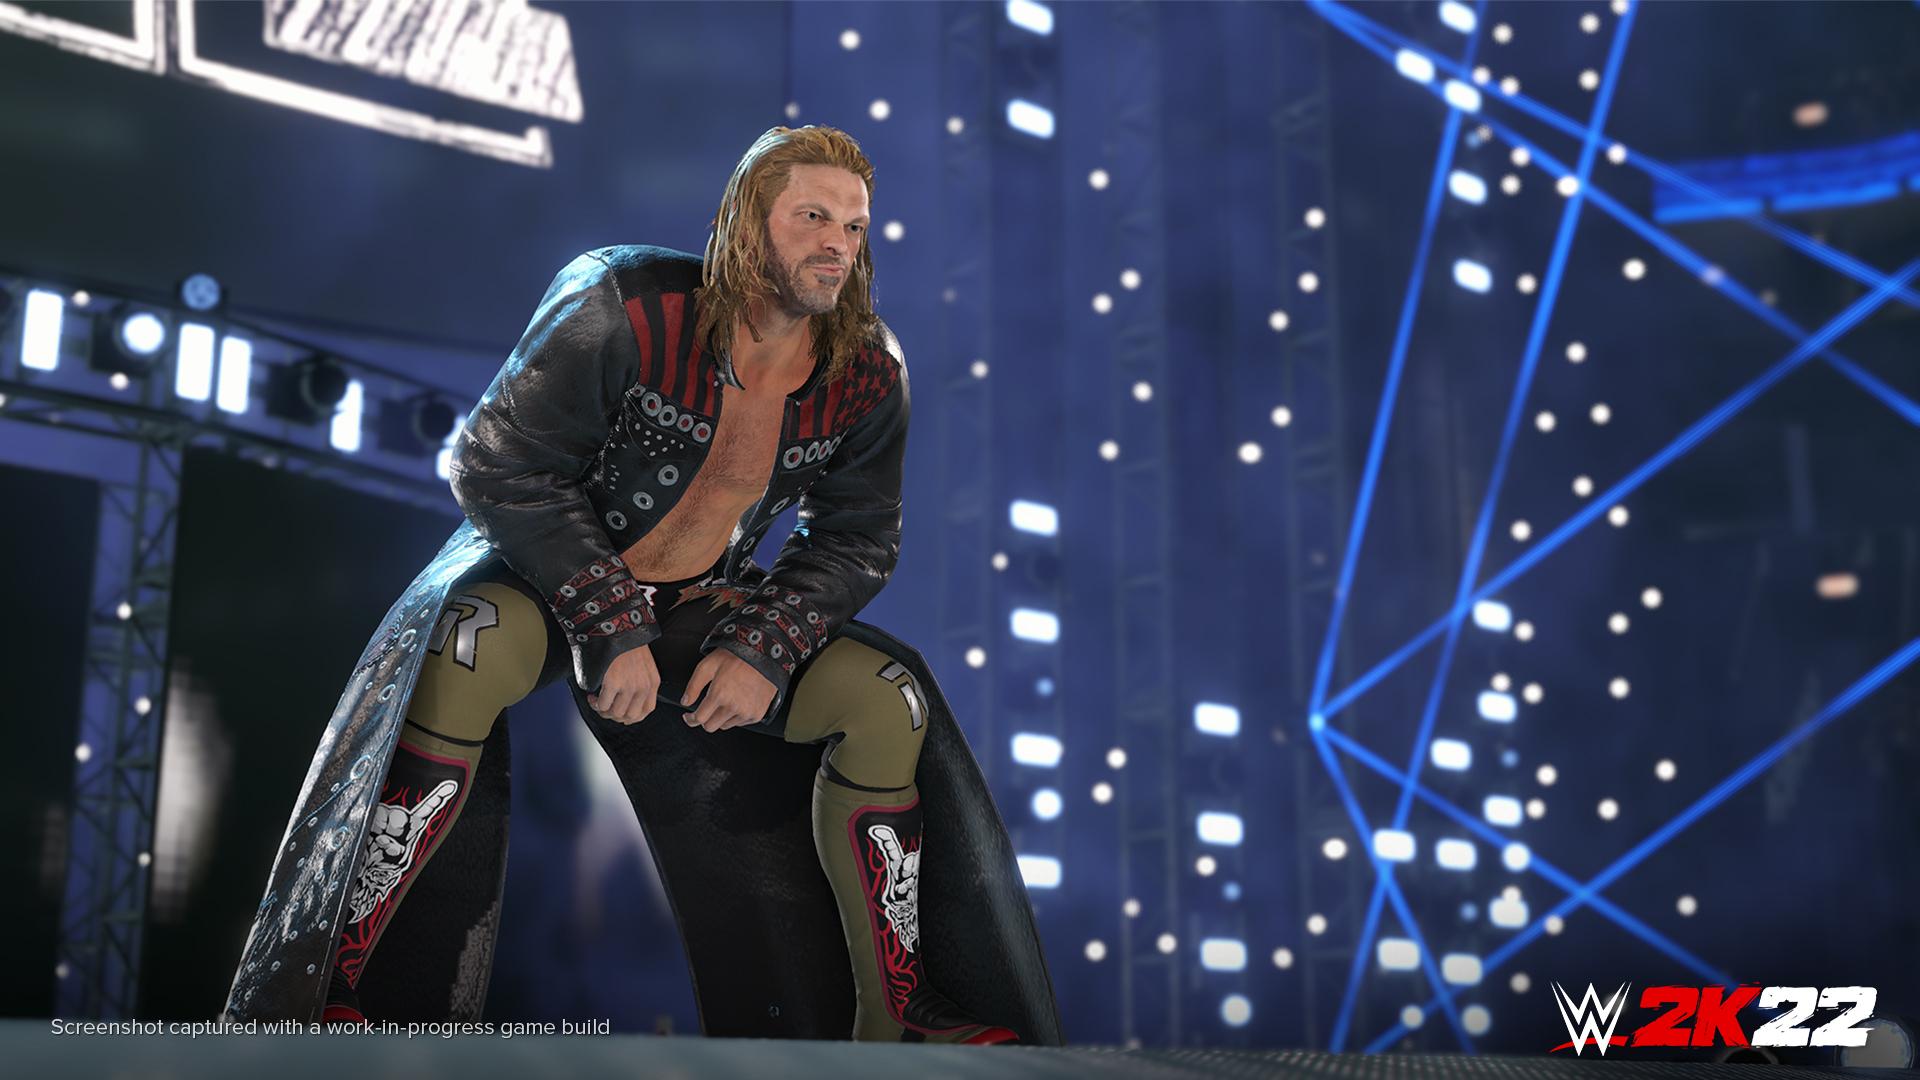 WWE 2K22: New Trailer Reveals Release Period